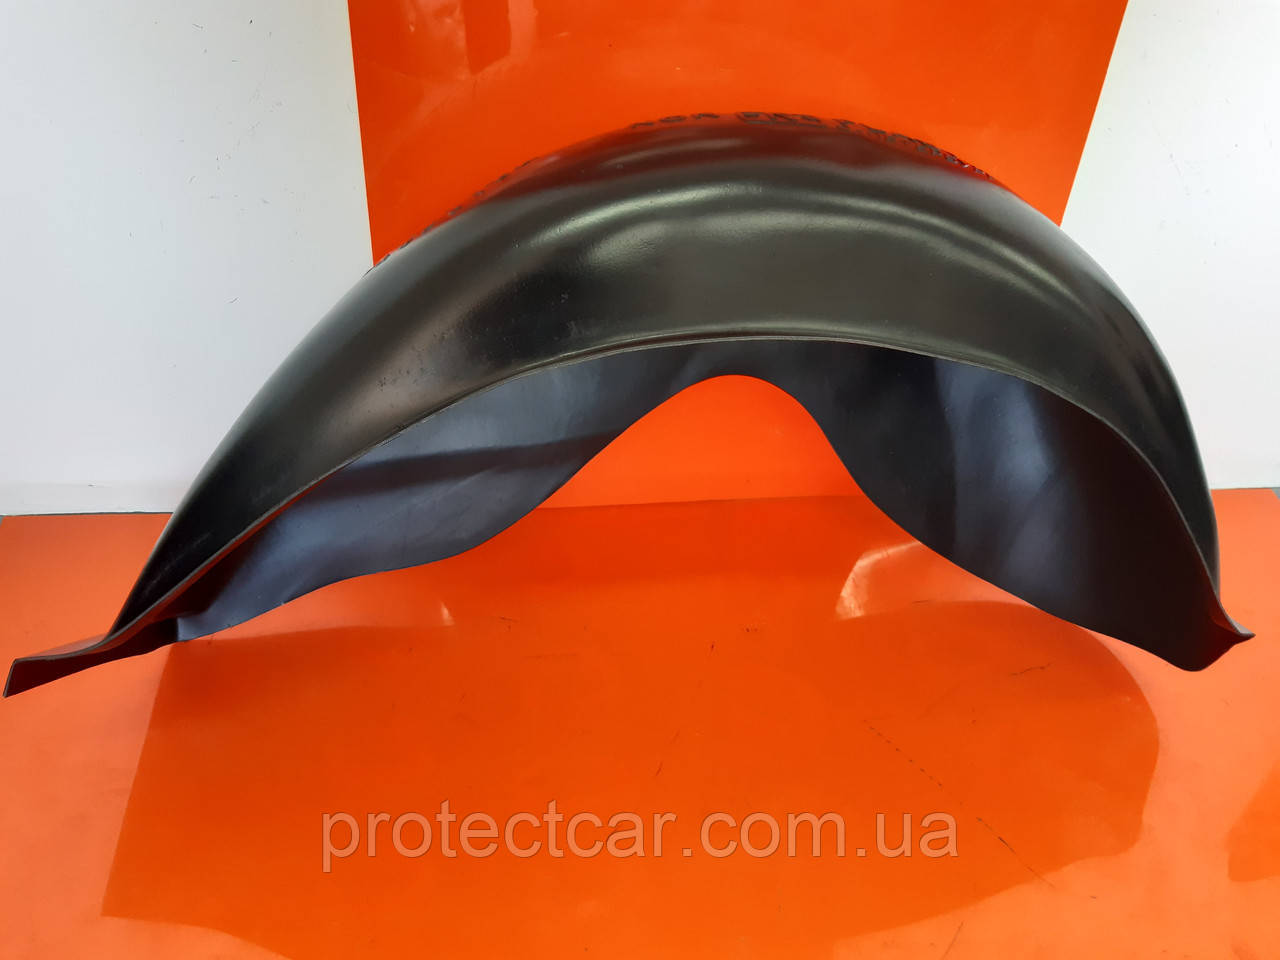 Подкрылки Mercedes w123 (комплект 4 шт), защита арок 123